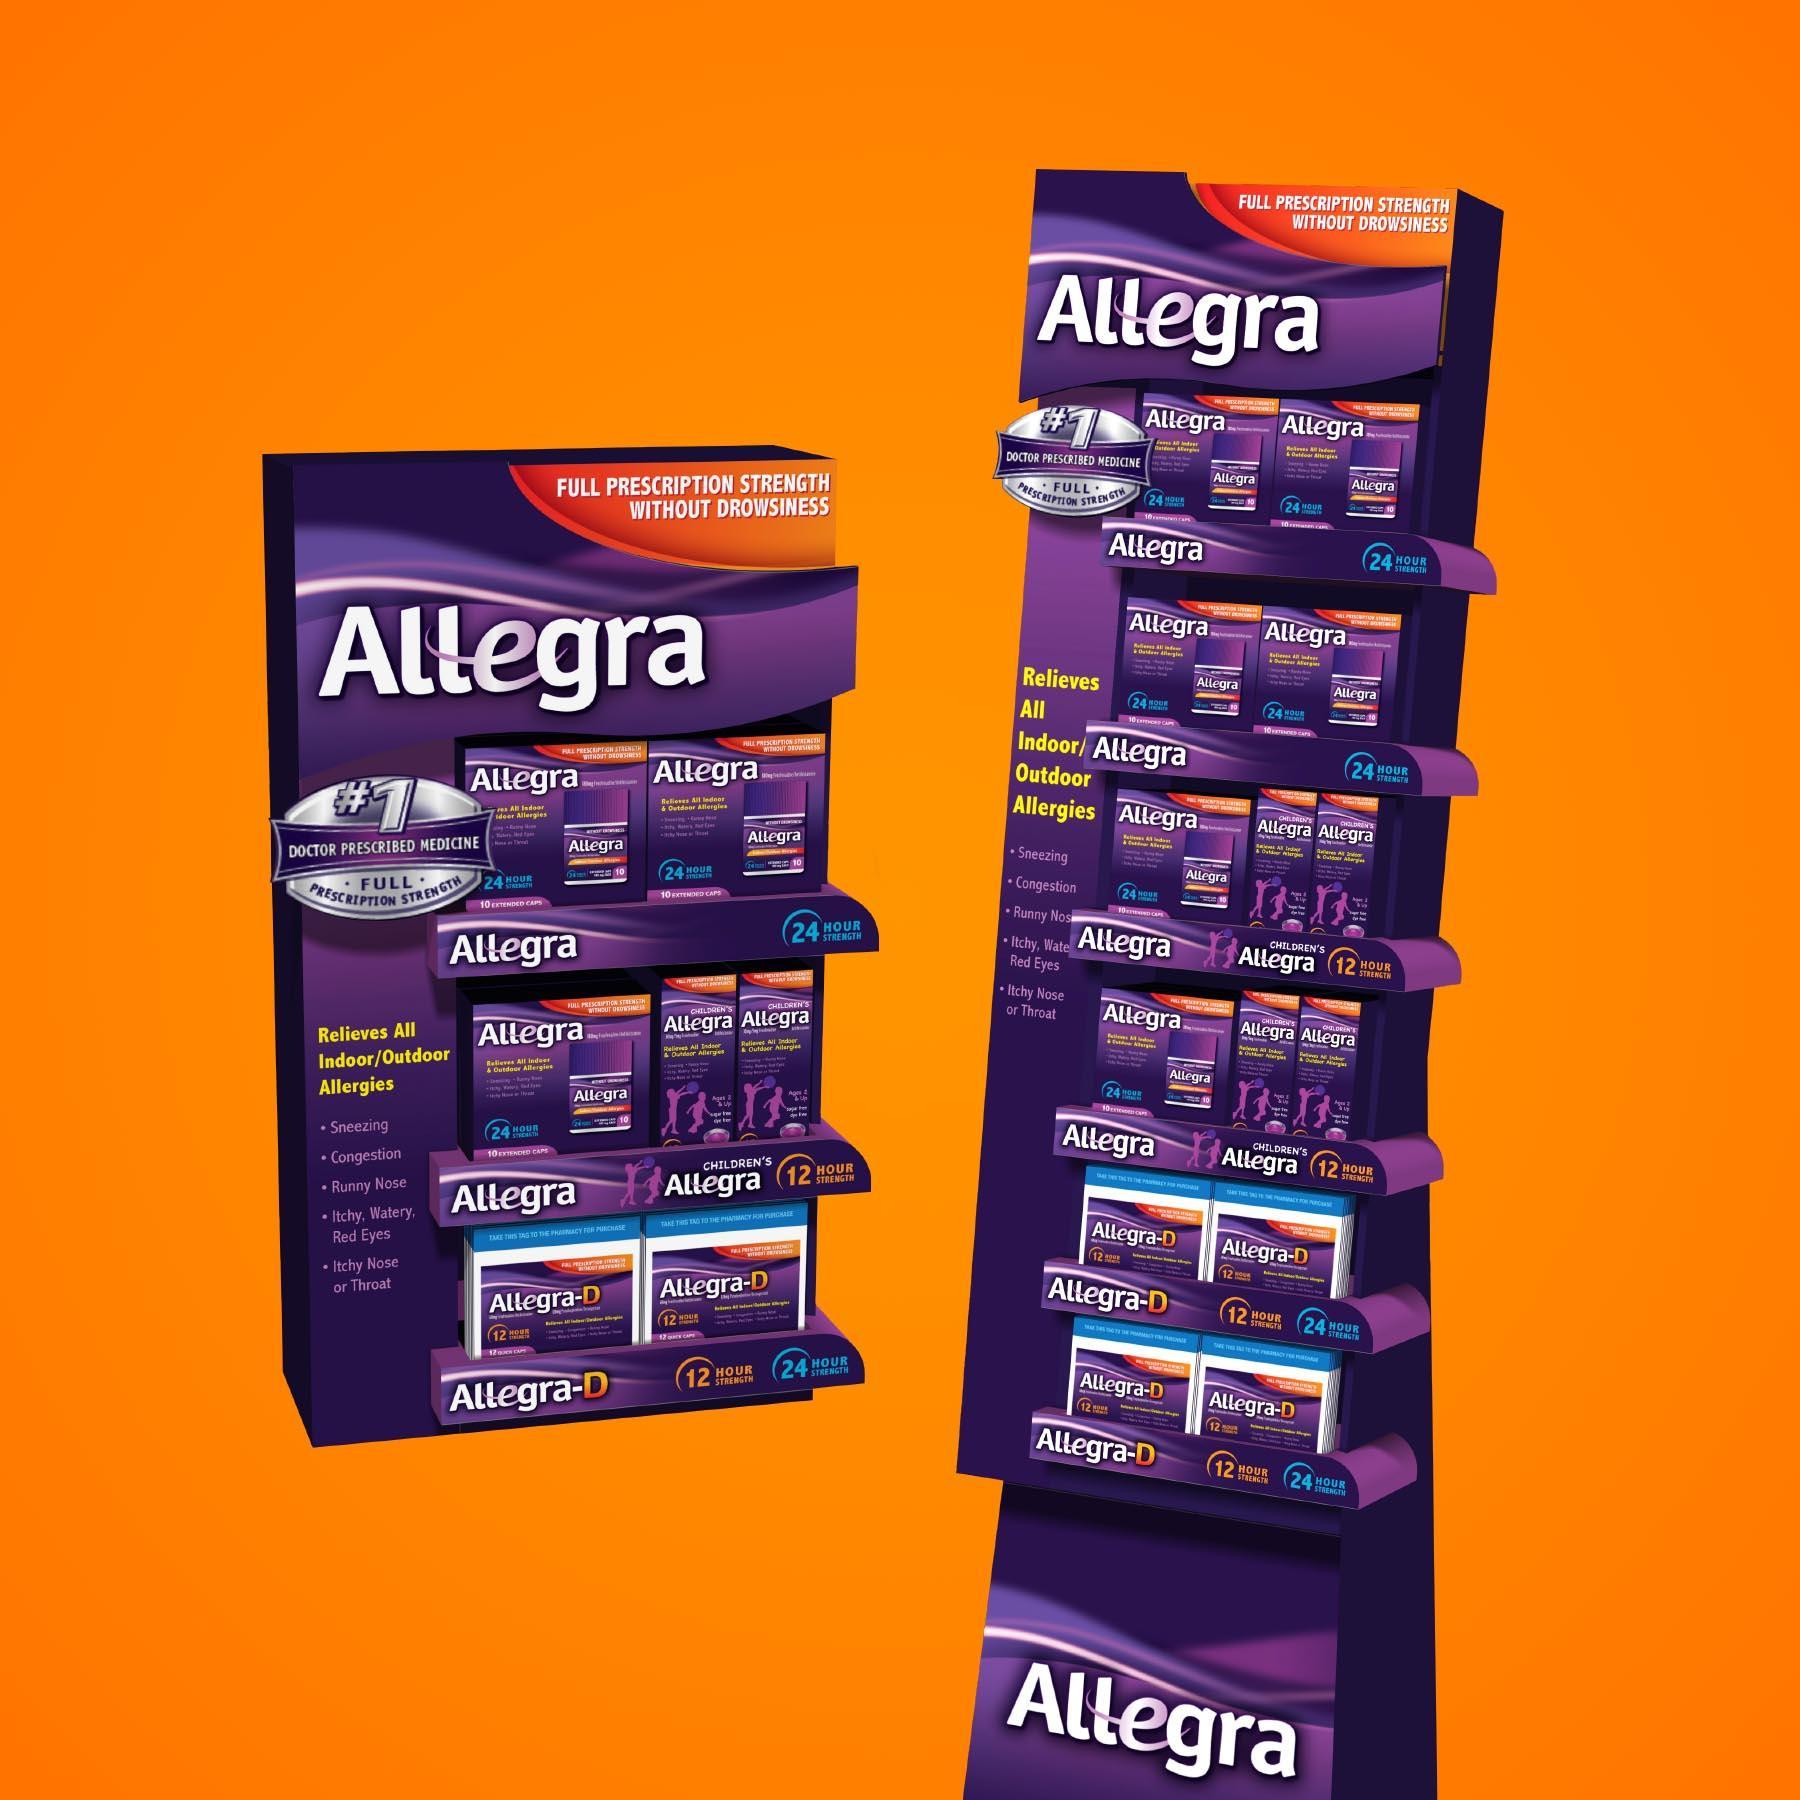 Allegra Allergy Point of Sale Display